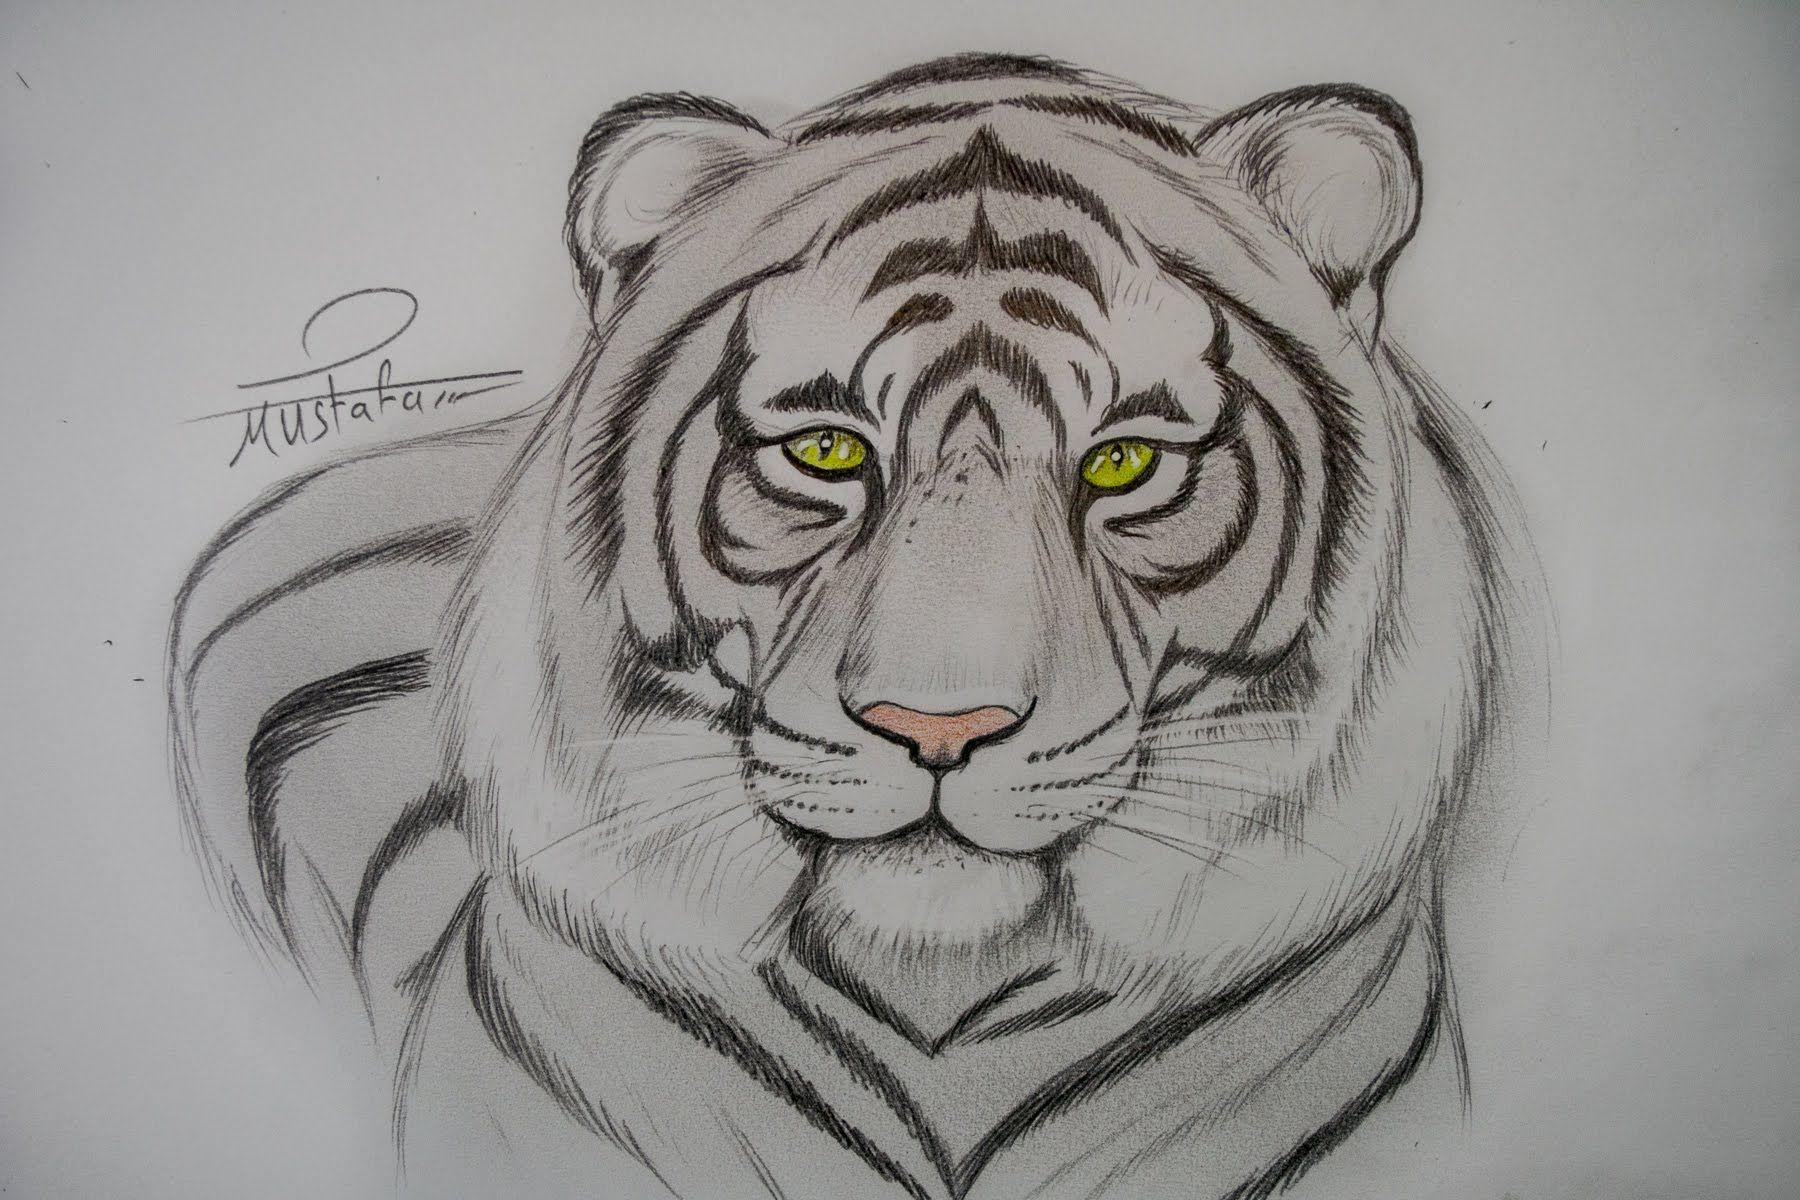 تعلم رسم نمر بالرصاص مع الخطوات للمبتدئين Animal Drawings Drawings Animal Tattoo